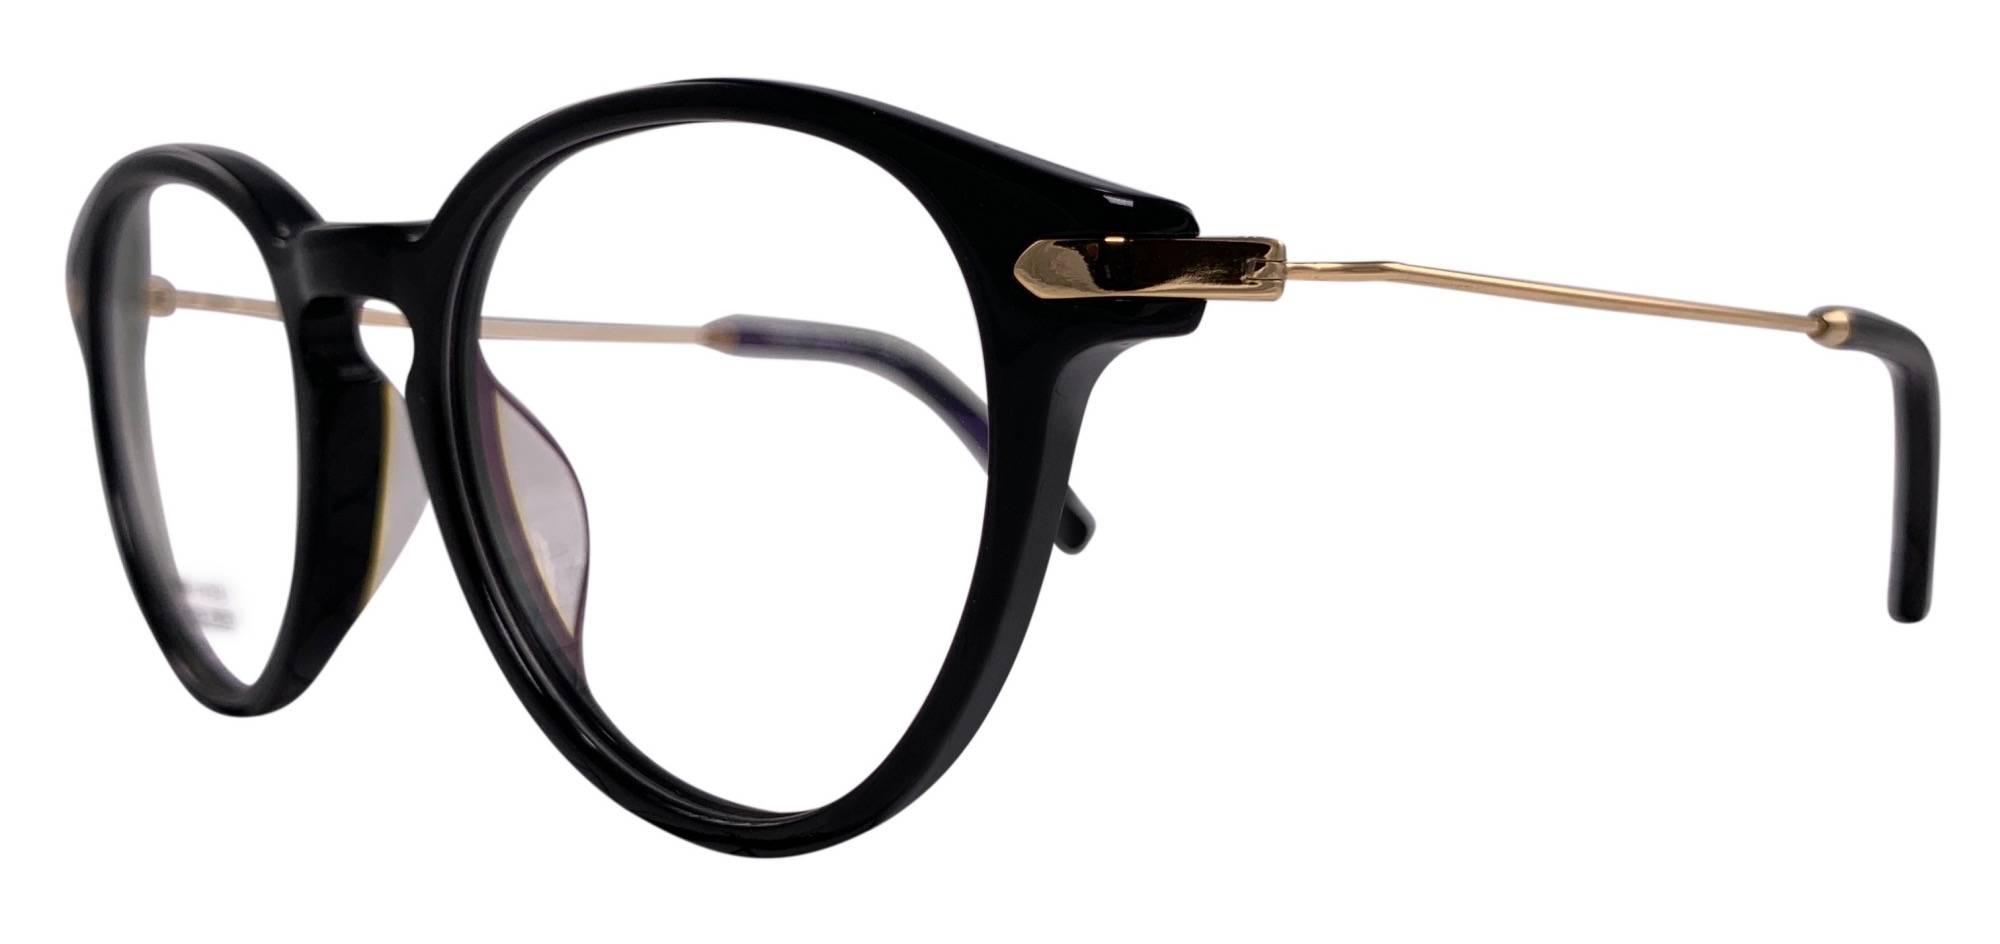 Olivitas Eyewear